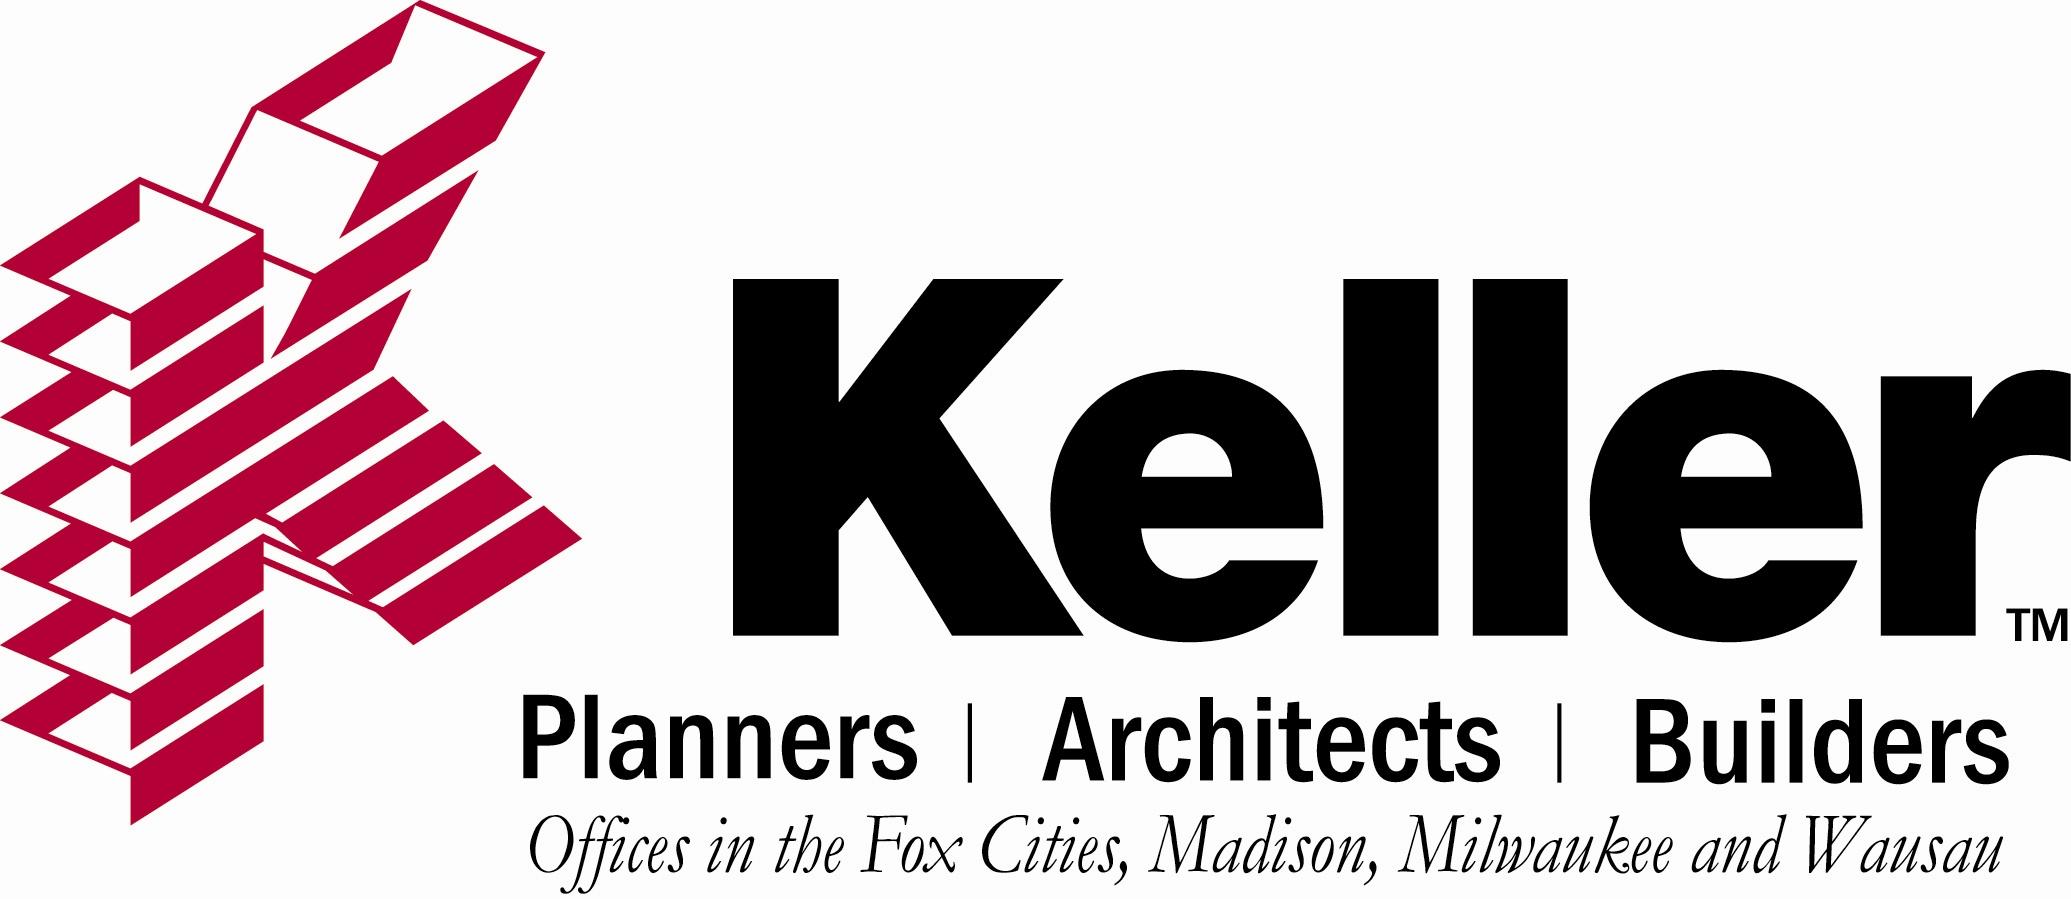 Keller Logo Horiz- with tag.JPG